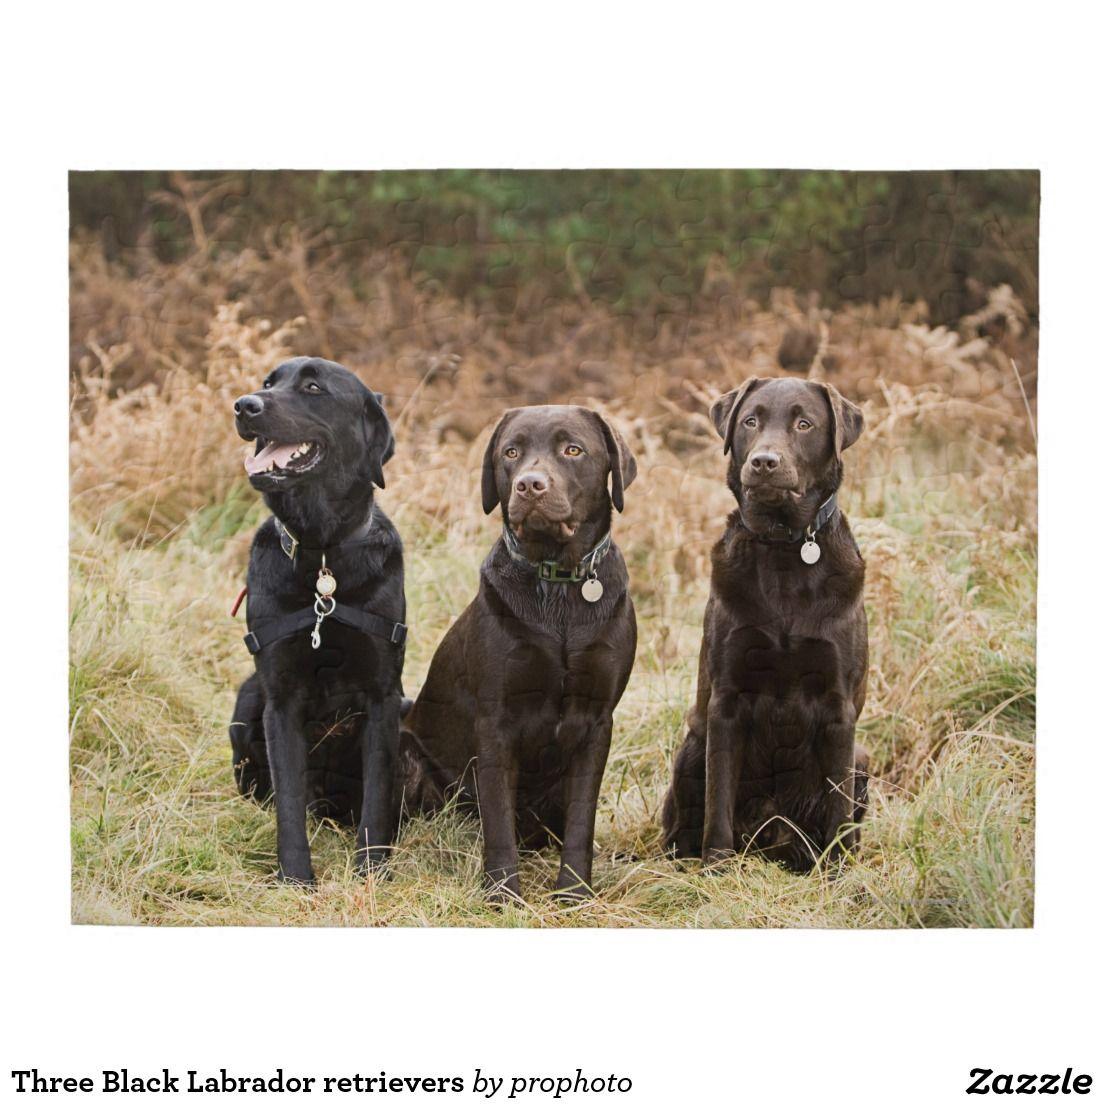 Three Black Labrador Retrievers Jigsaw Puzzle Zazzle Com Black Labrador Retriever Labrador Retriever Black Labrador